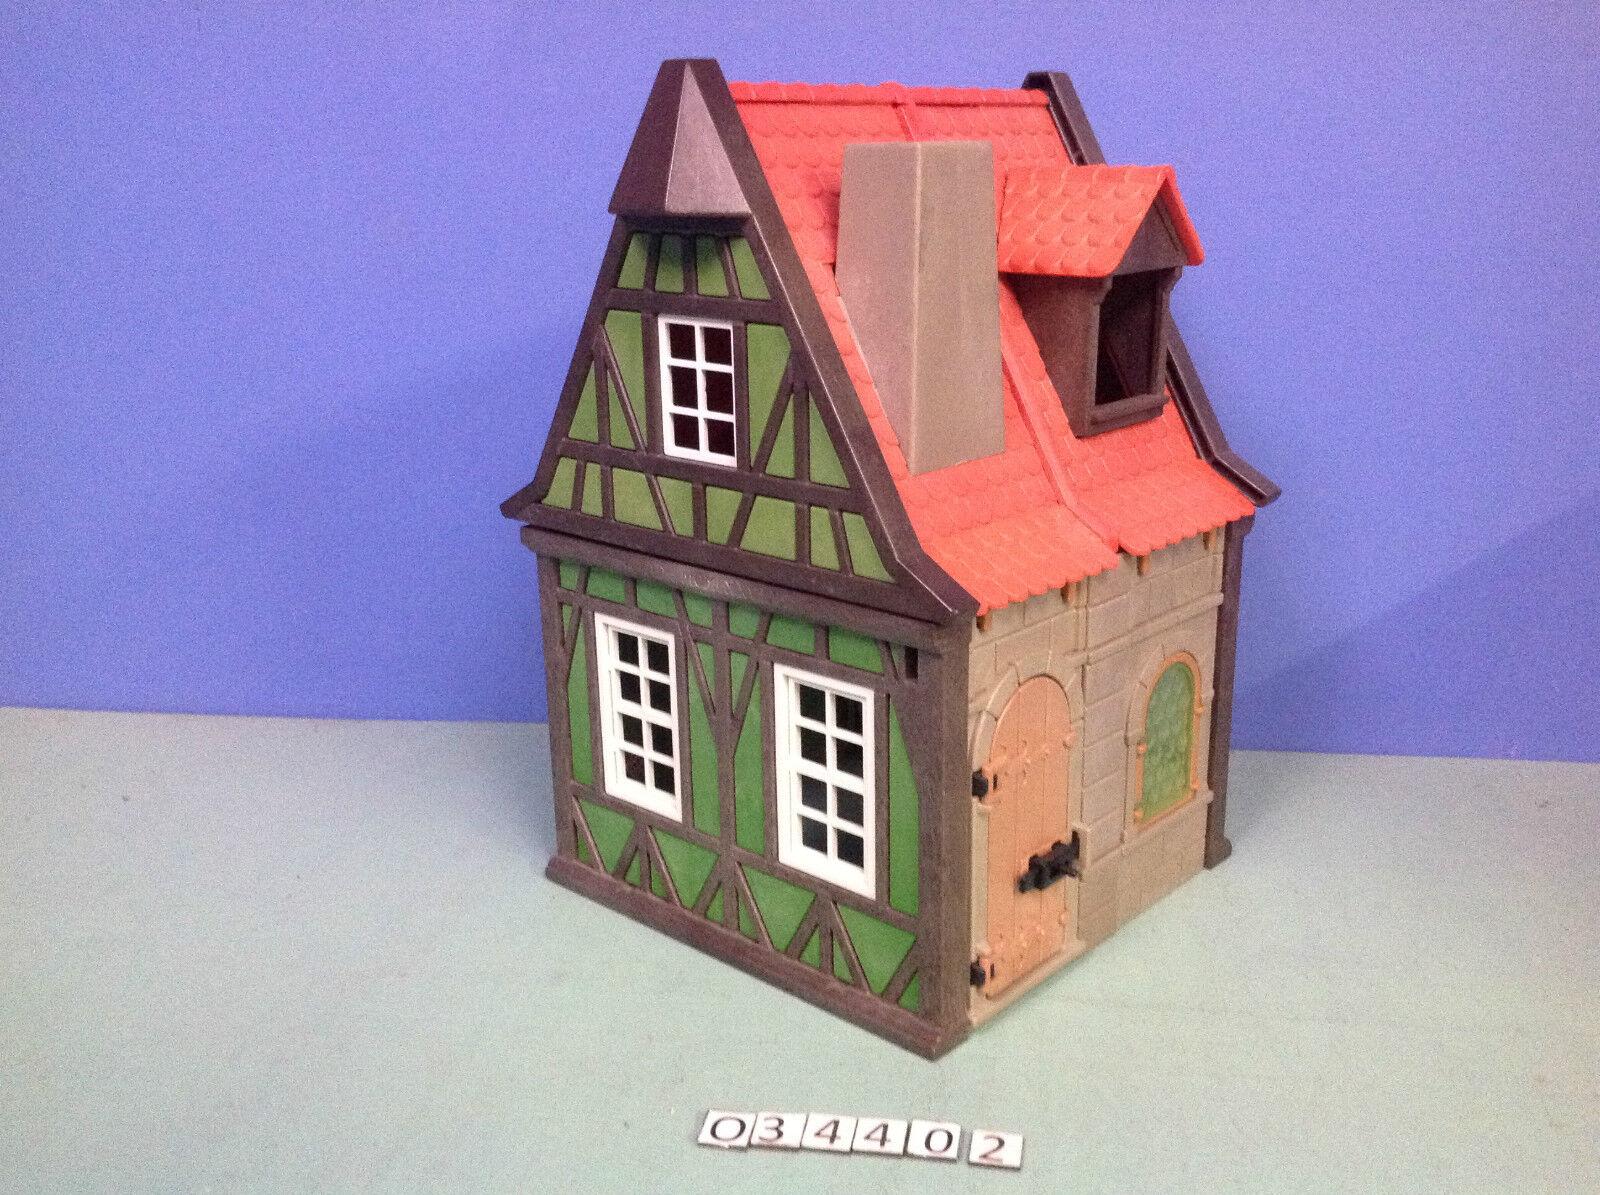 (O3440.2) playmobil Maison Médiévale  verdee le Dimensioneur ref 3440 3666  in vendita